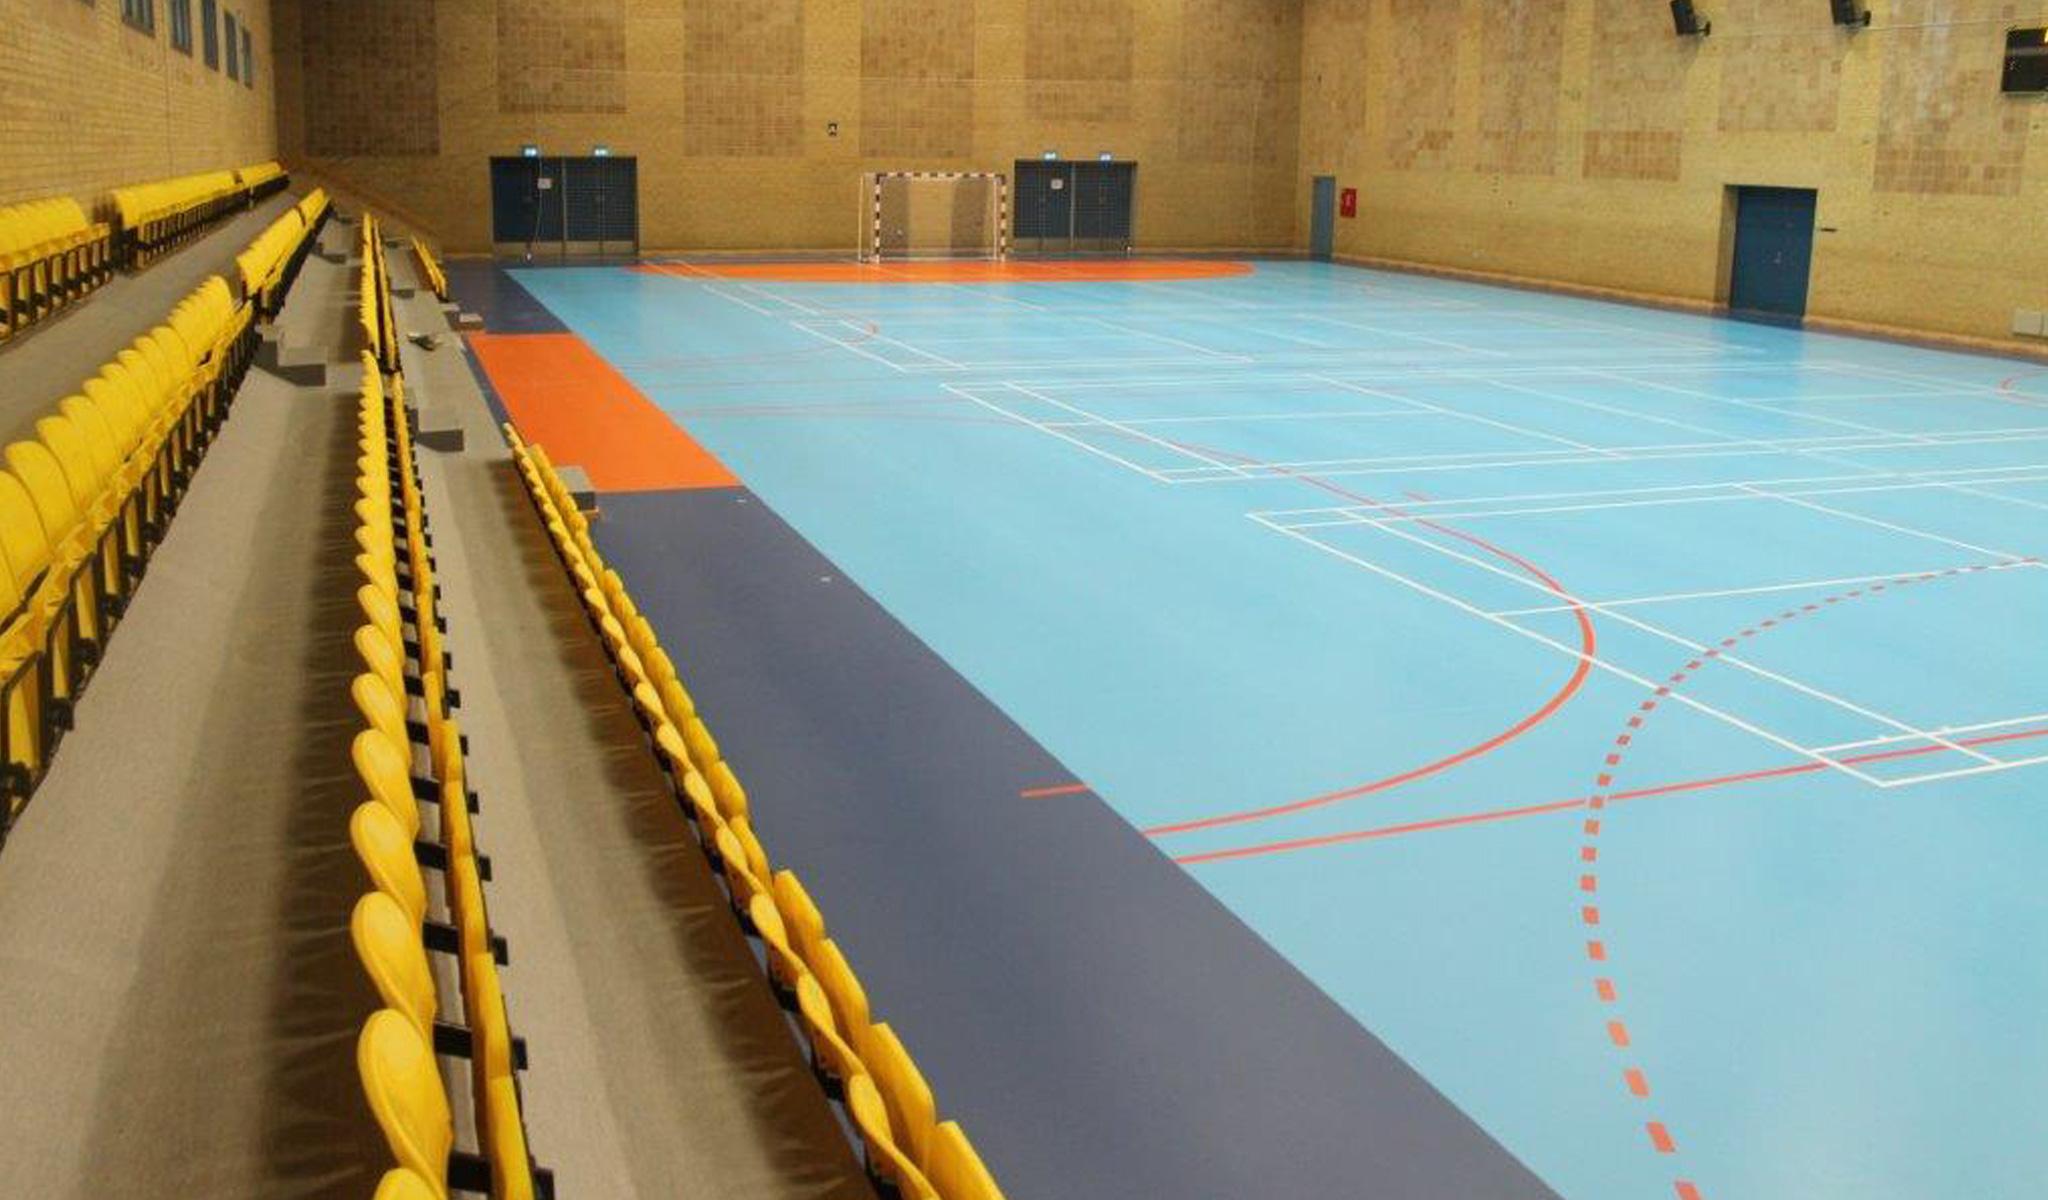 sportsgulv sportsgulve unisport taraflex